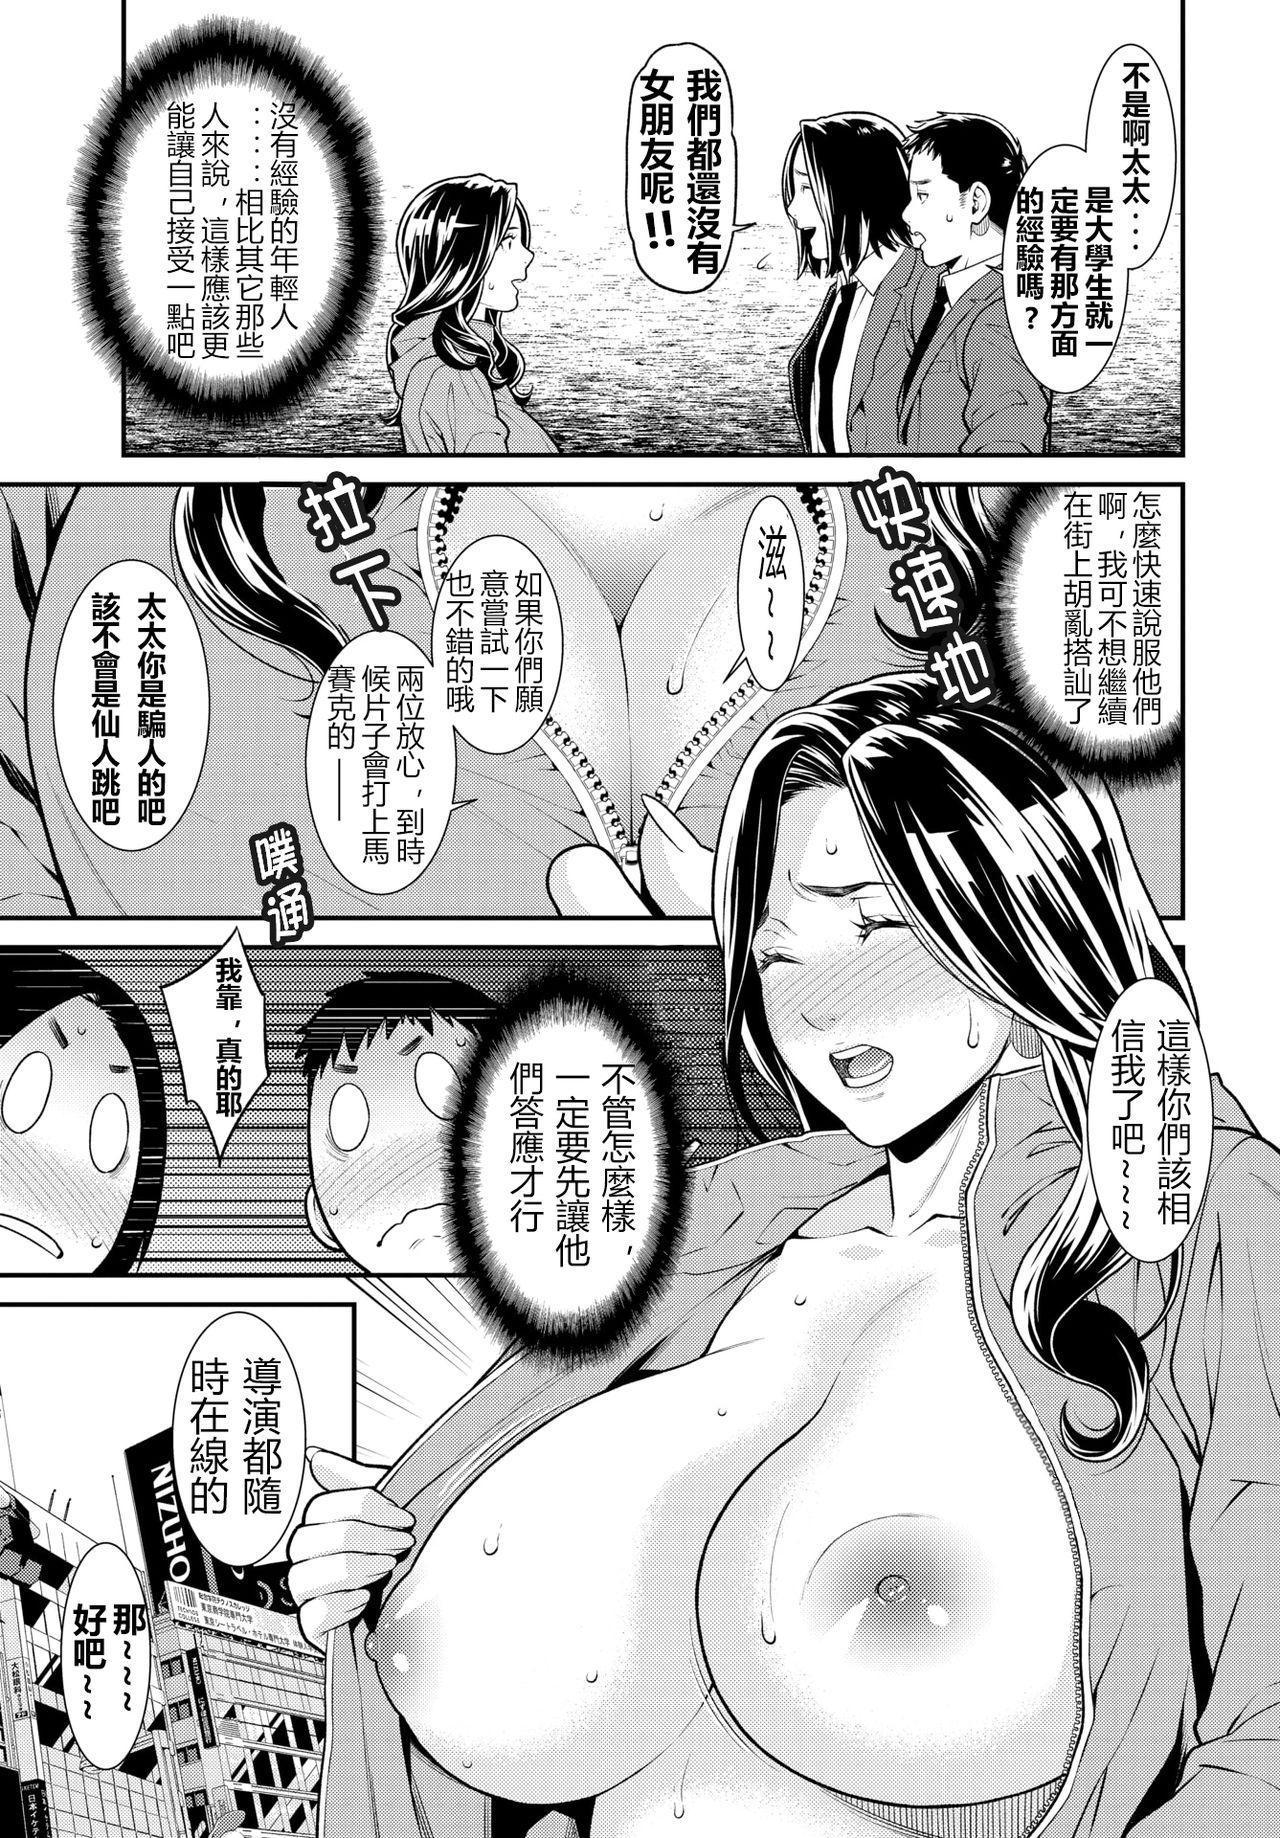 [Syuuen] Secret Wife  1-6 [Chinese][鼠灣漢化](210206最新修复完整版)【極品人妻NTR】 25